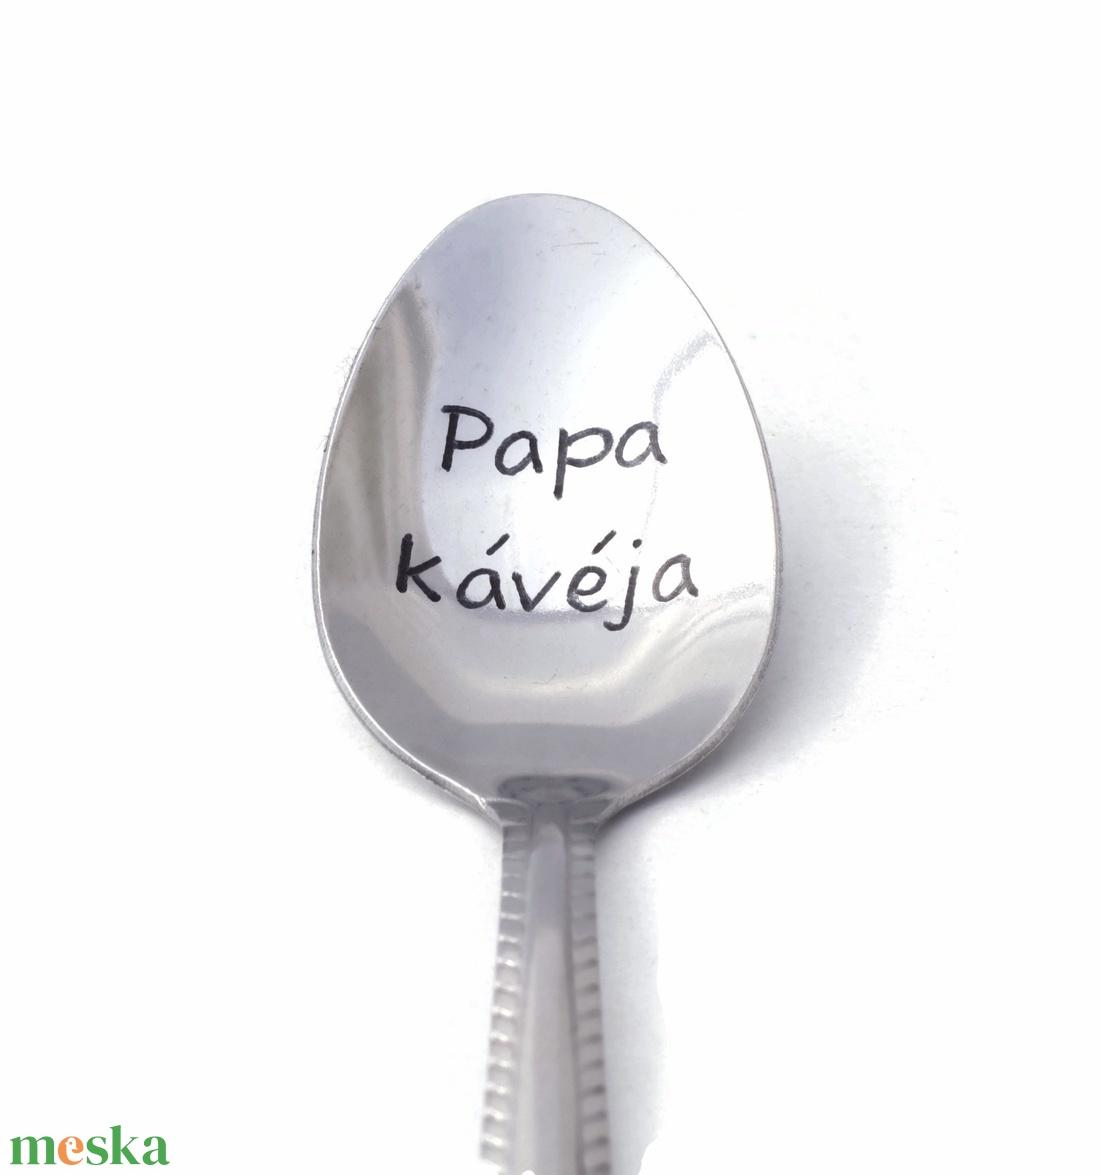 Papa kávéja! kiskanál (Revans) - Meska.hu